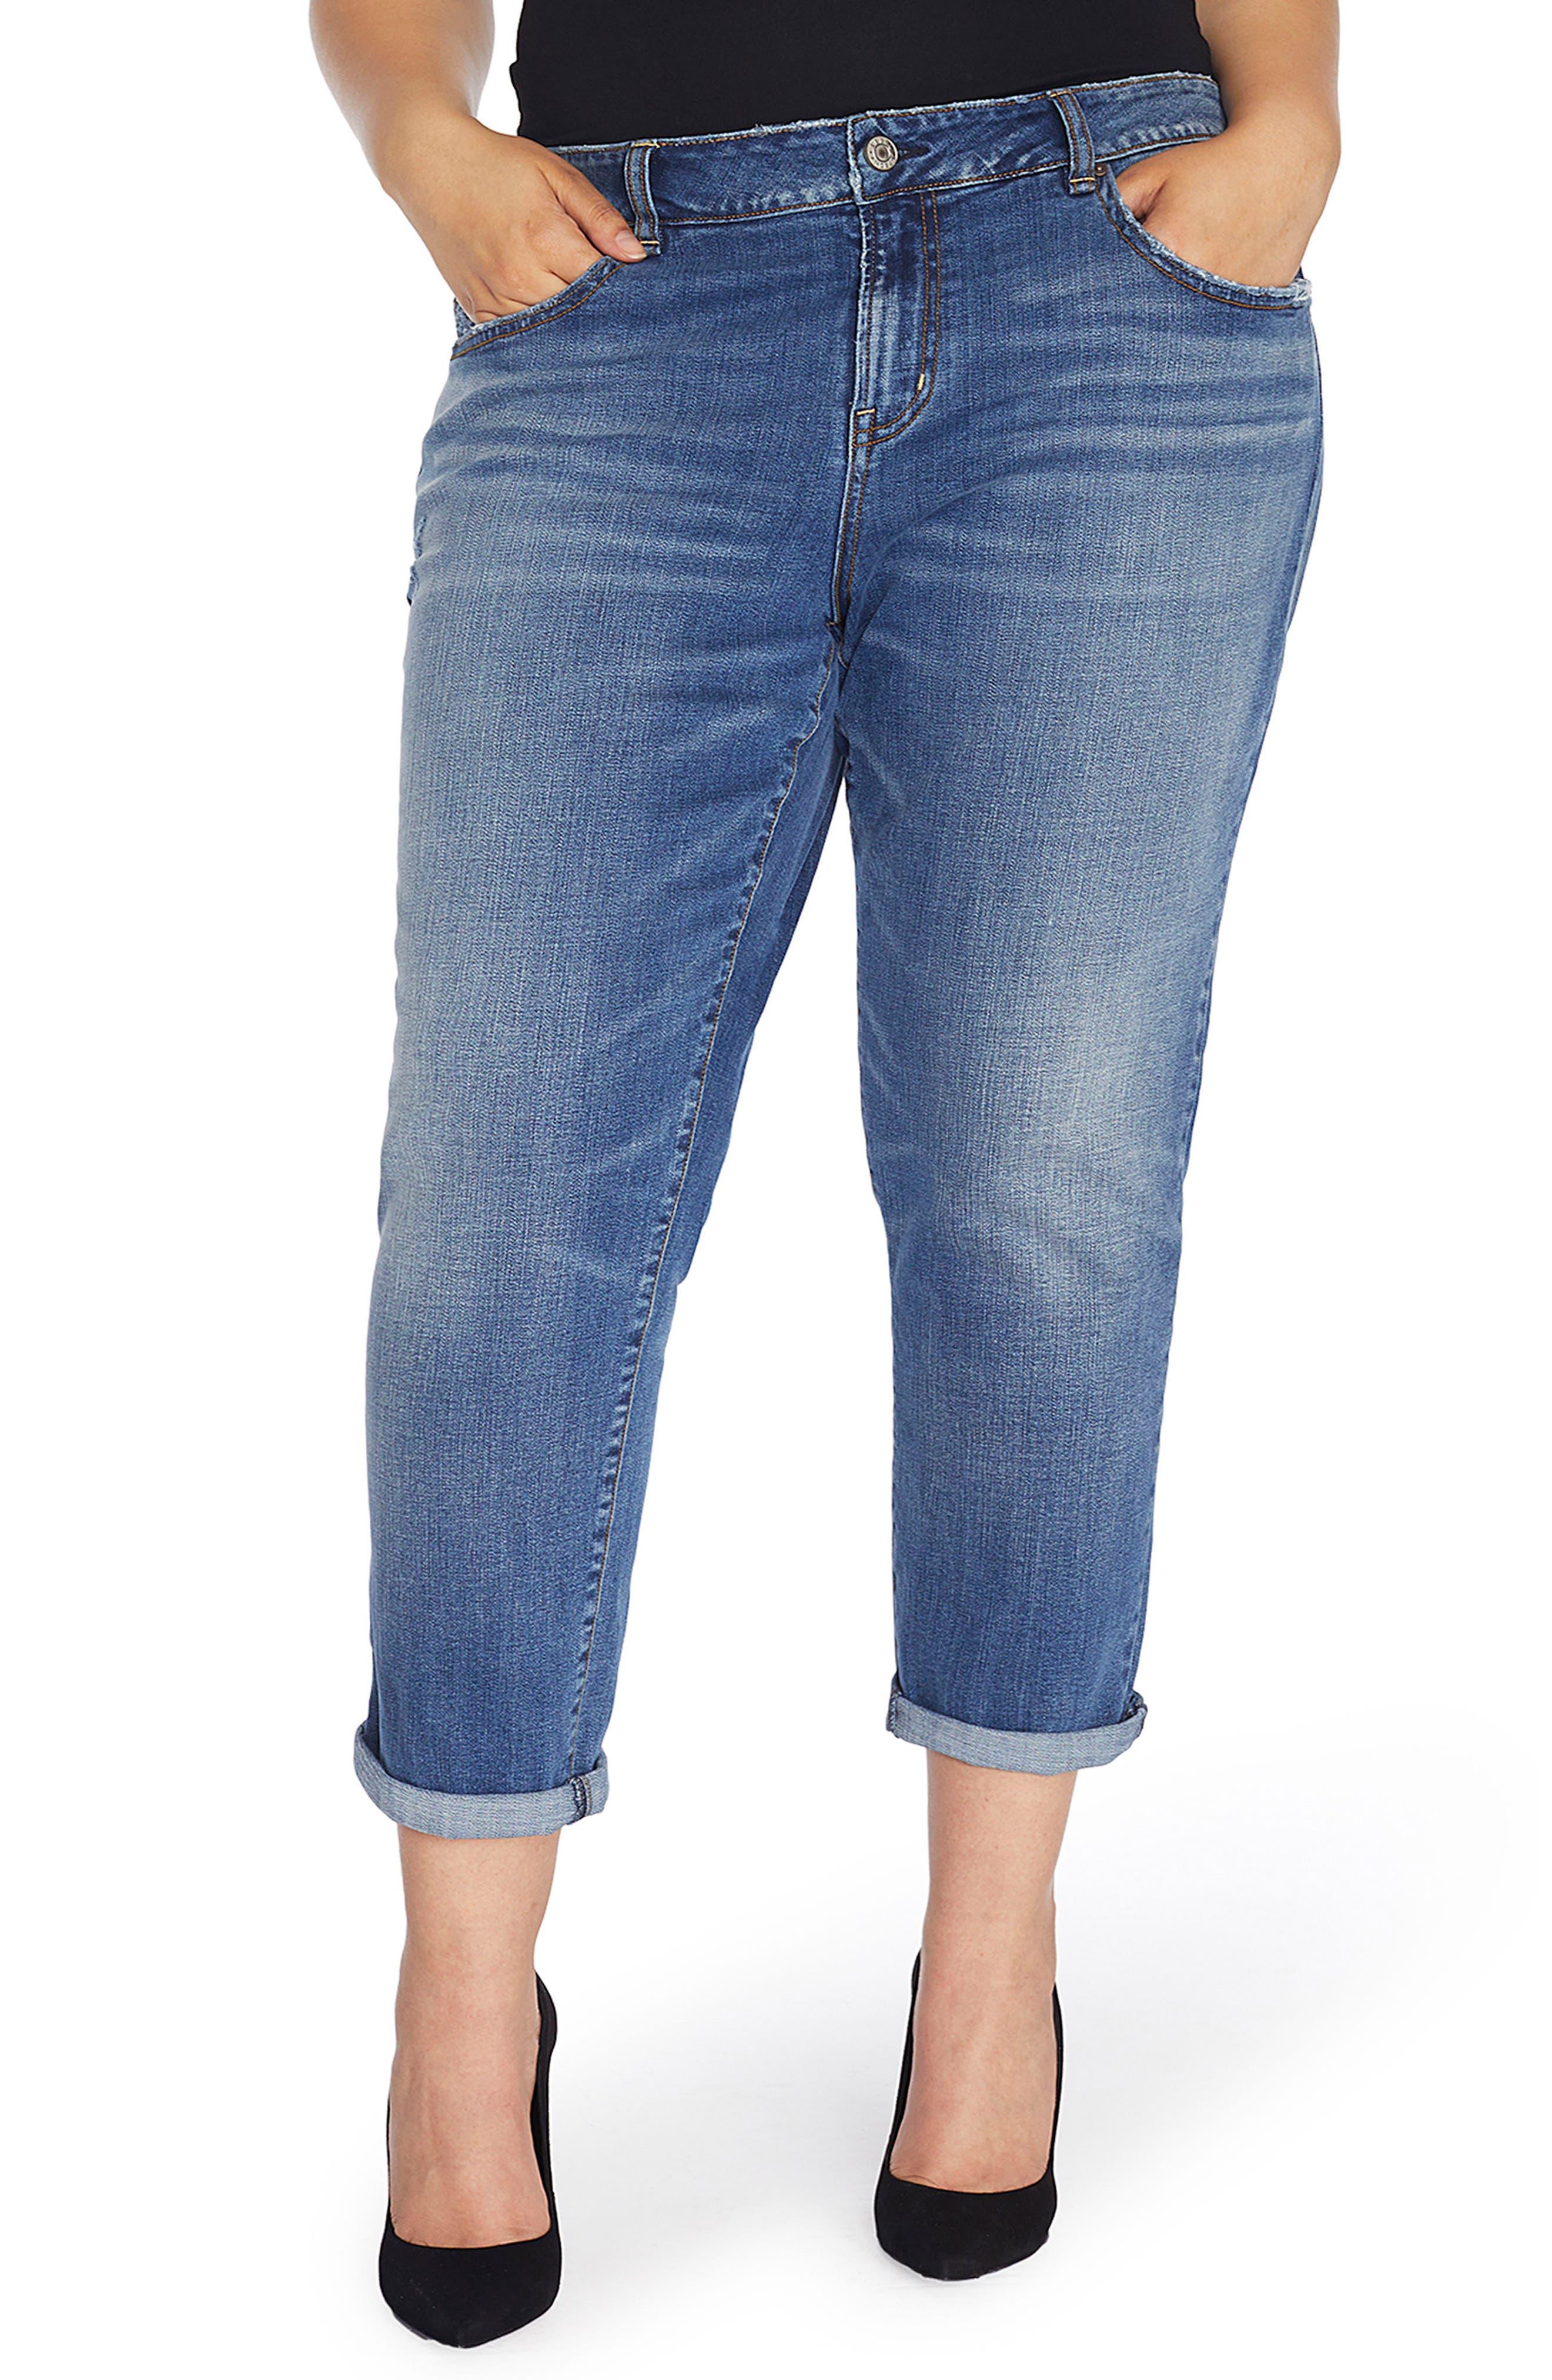 Main Image - Rebel Wilson x Angels The Ryot Slim Boyfriend Jeans (Plus Size)